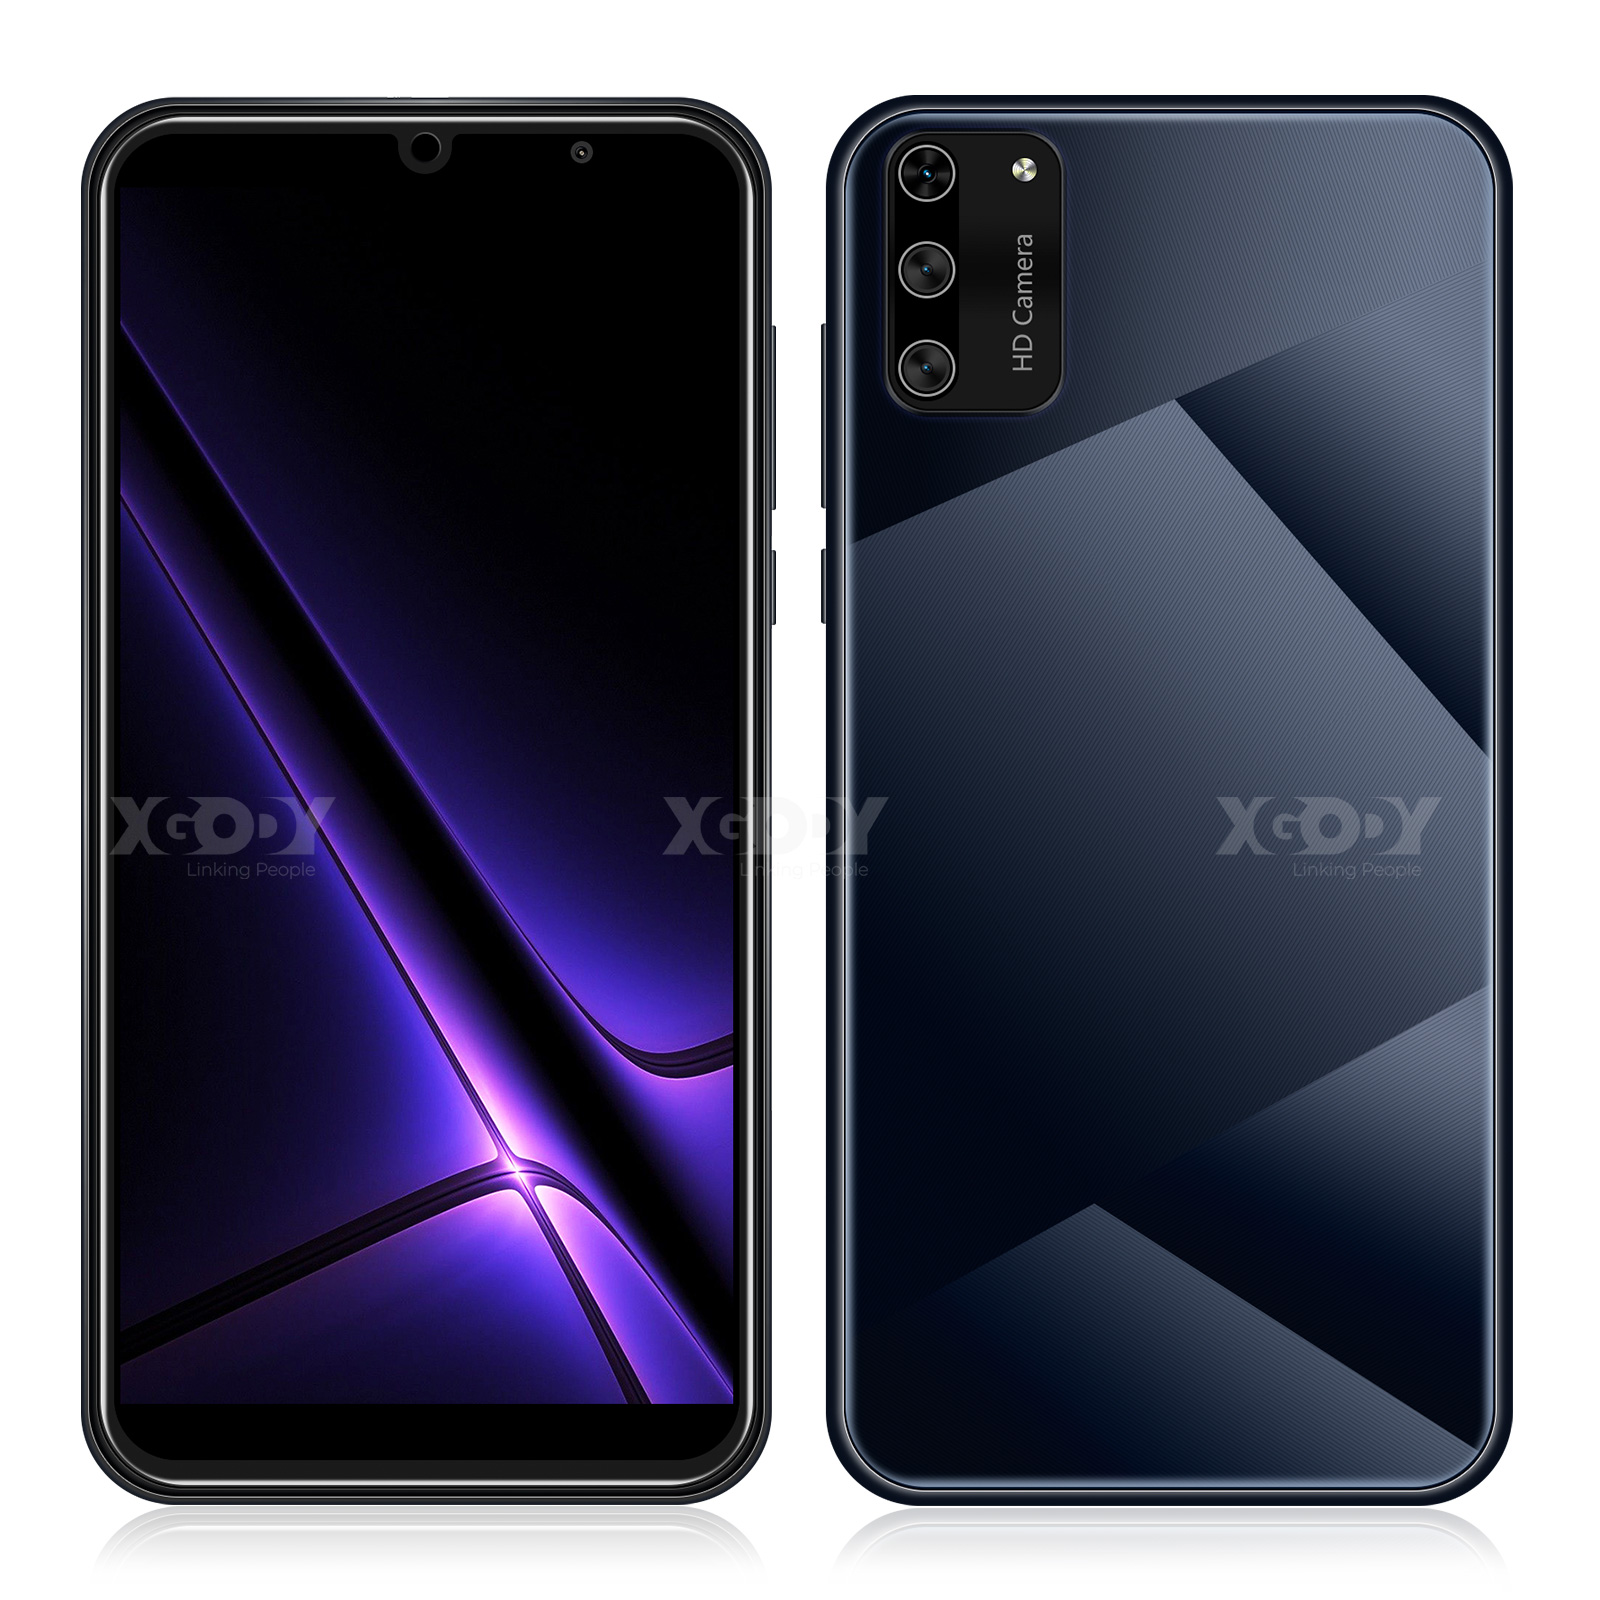 "XGODY S20 mini 3G teléfono inteligente 1GB de RAM 4GB ROM teléfonos móviles Android 9,0 Dual SIM 5,5 ""teléfono móvil 5MP Cámara WiFi teléfono celular"